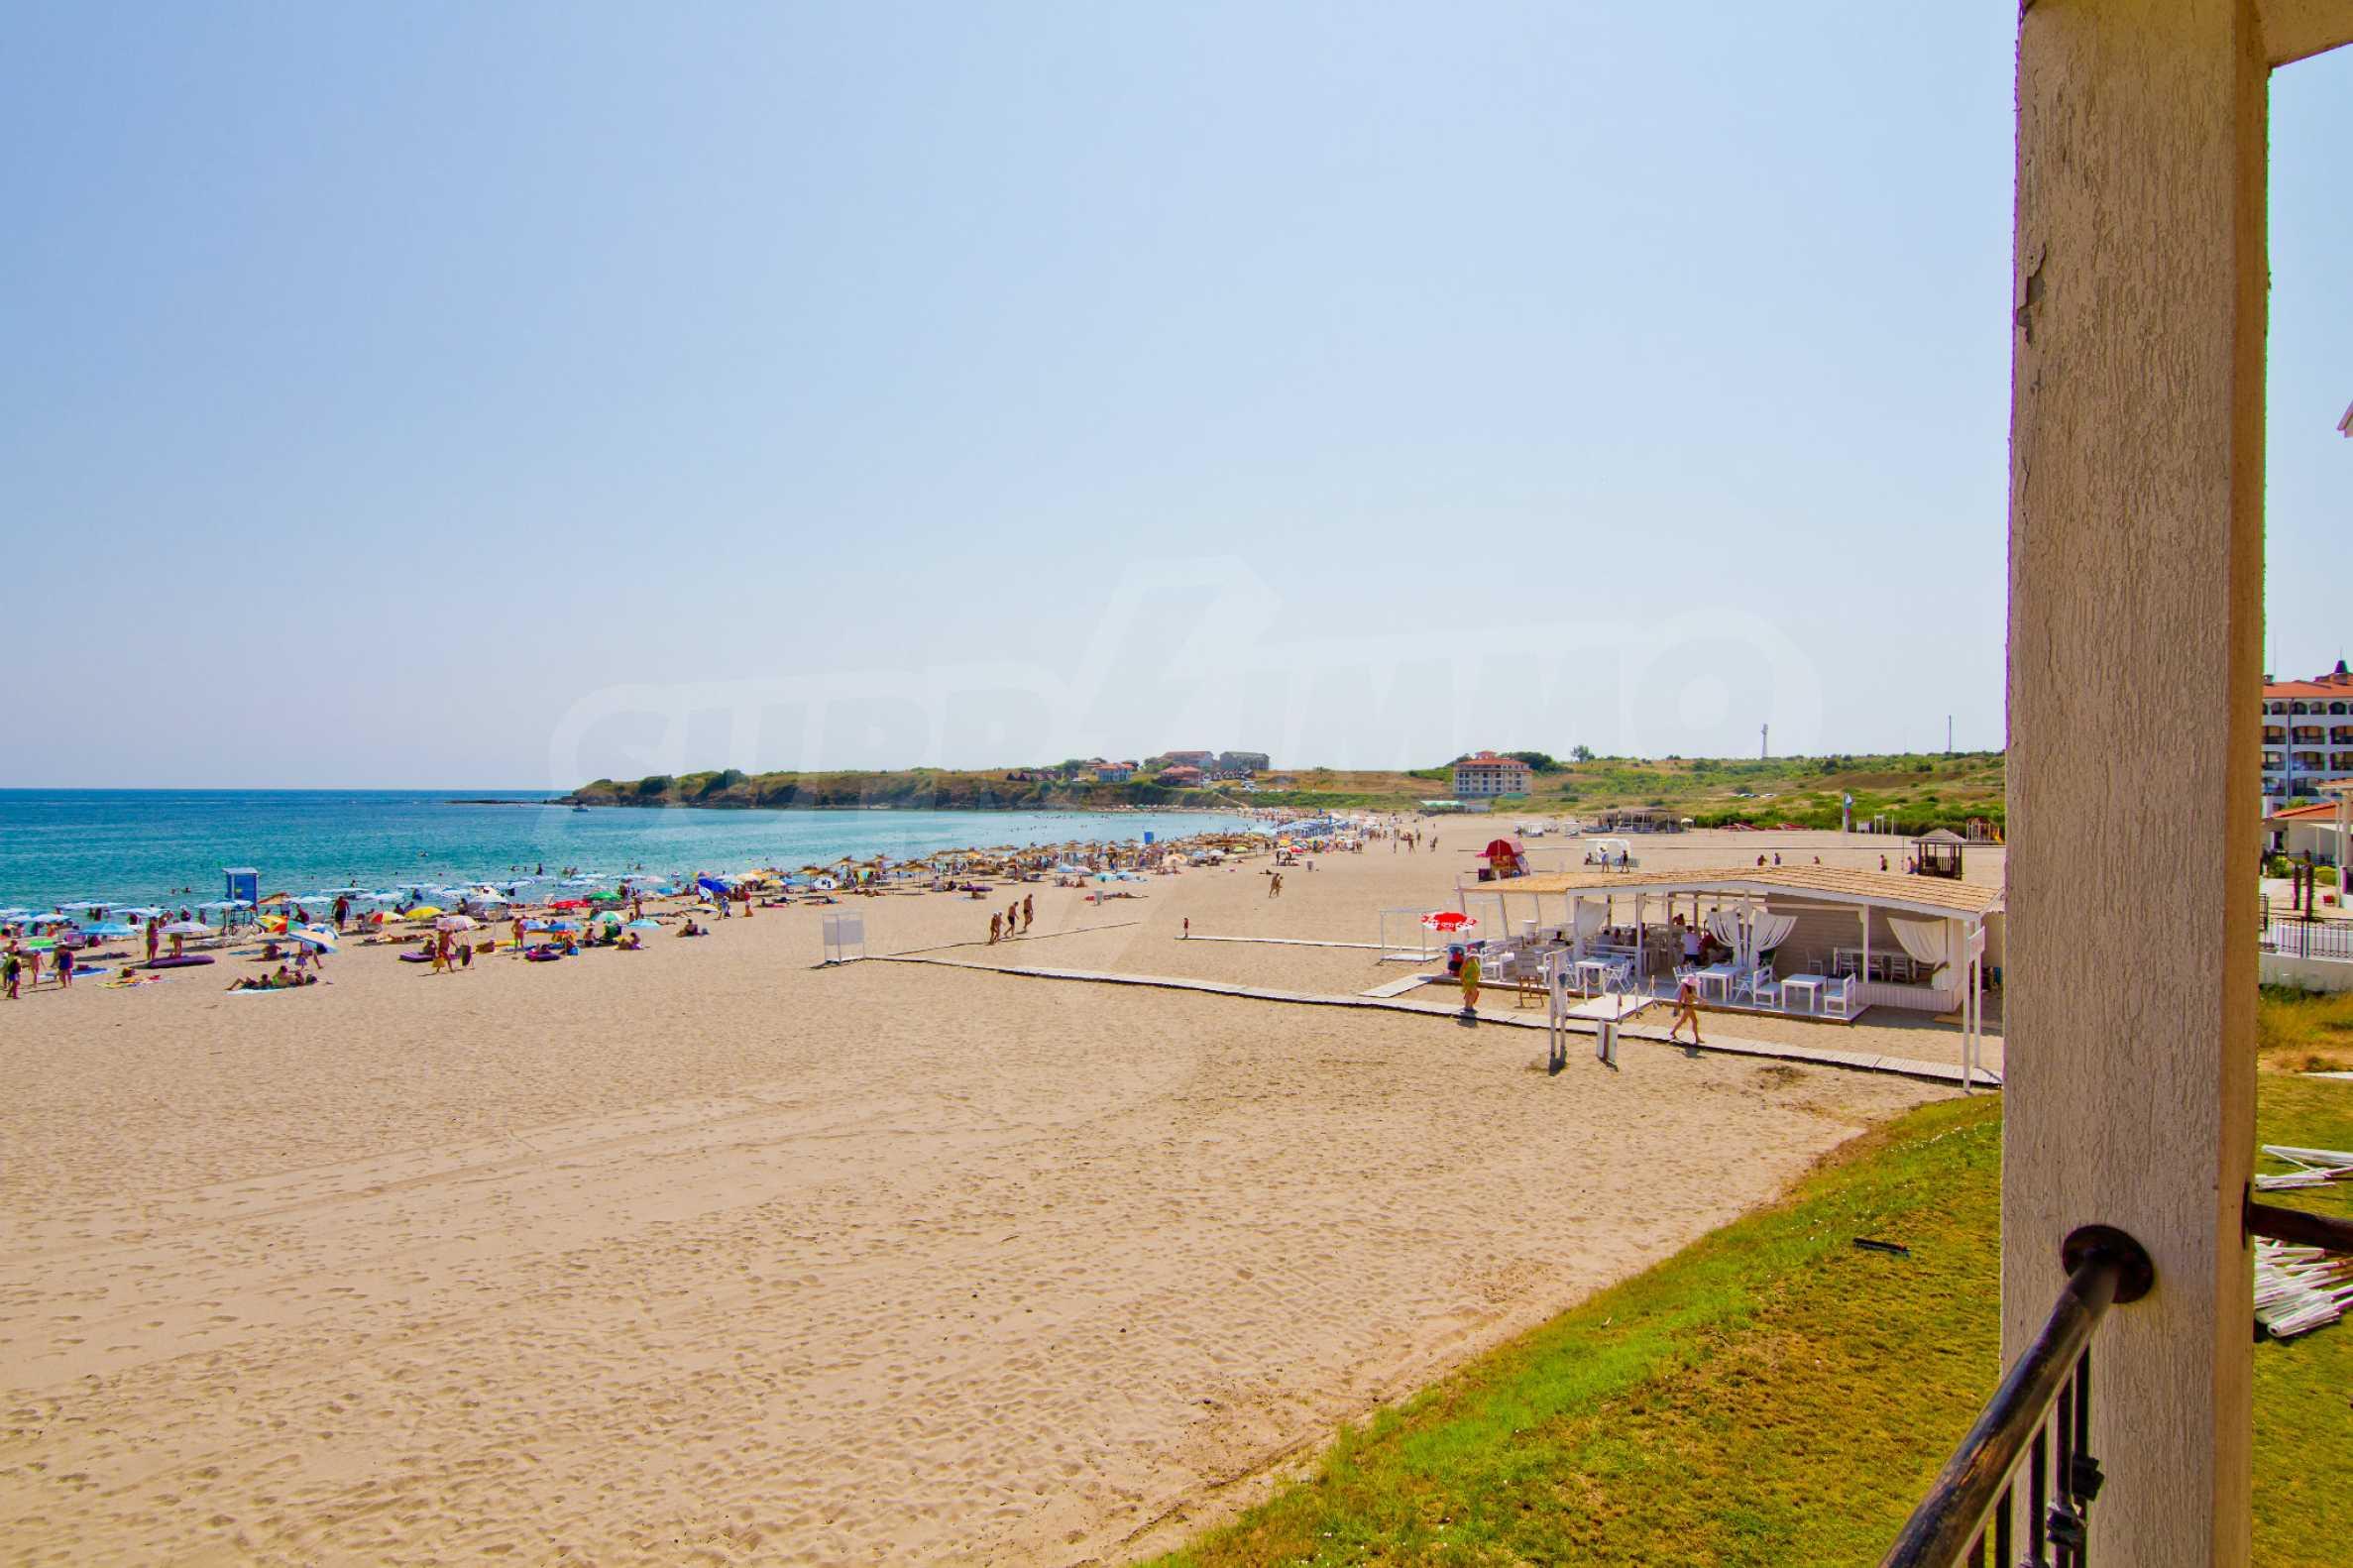 Примеа Бийч Резиденс / Primea Beach Residence 60